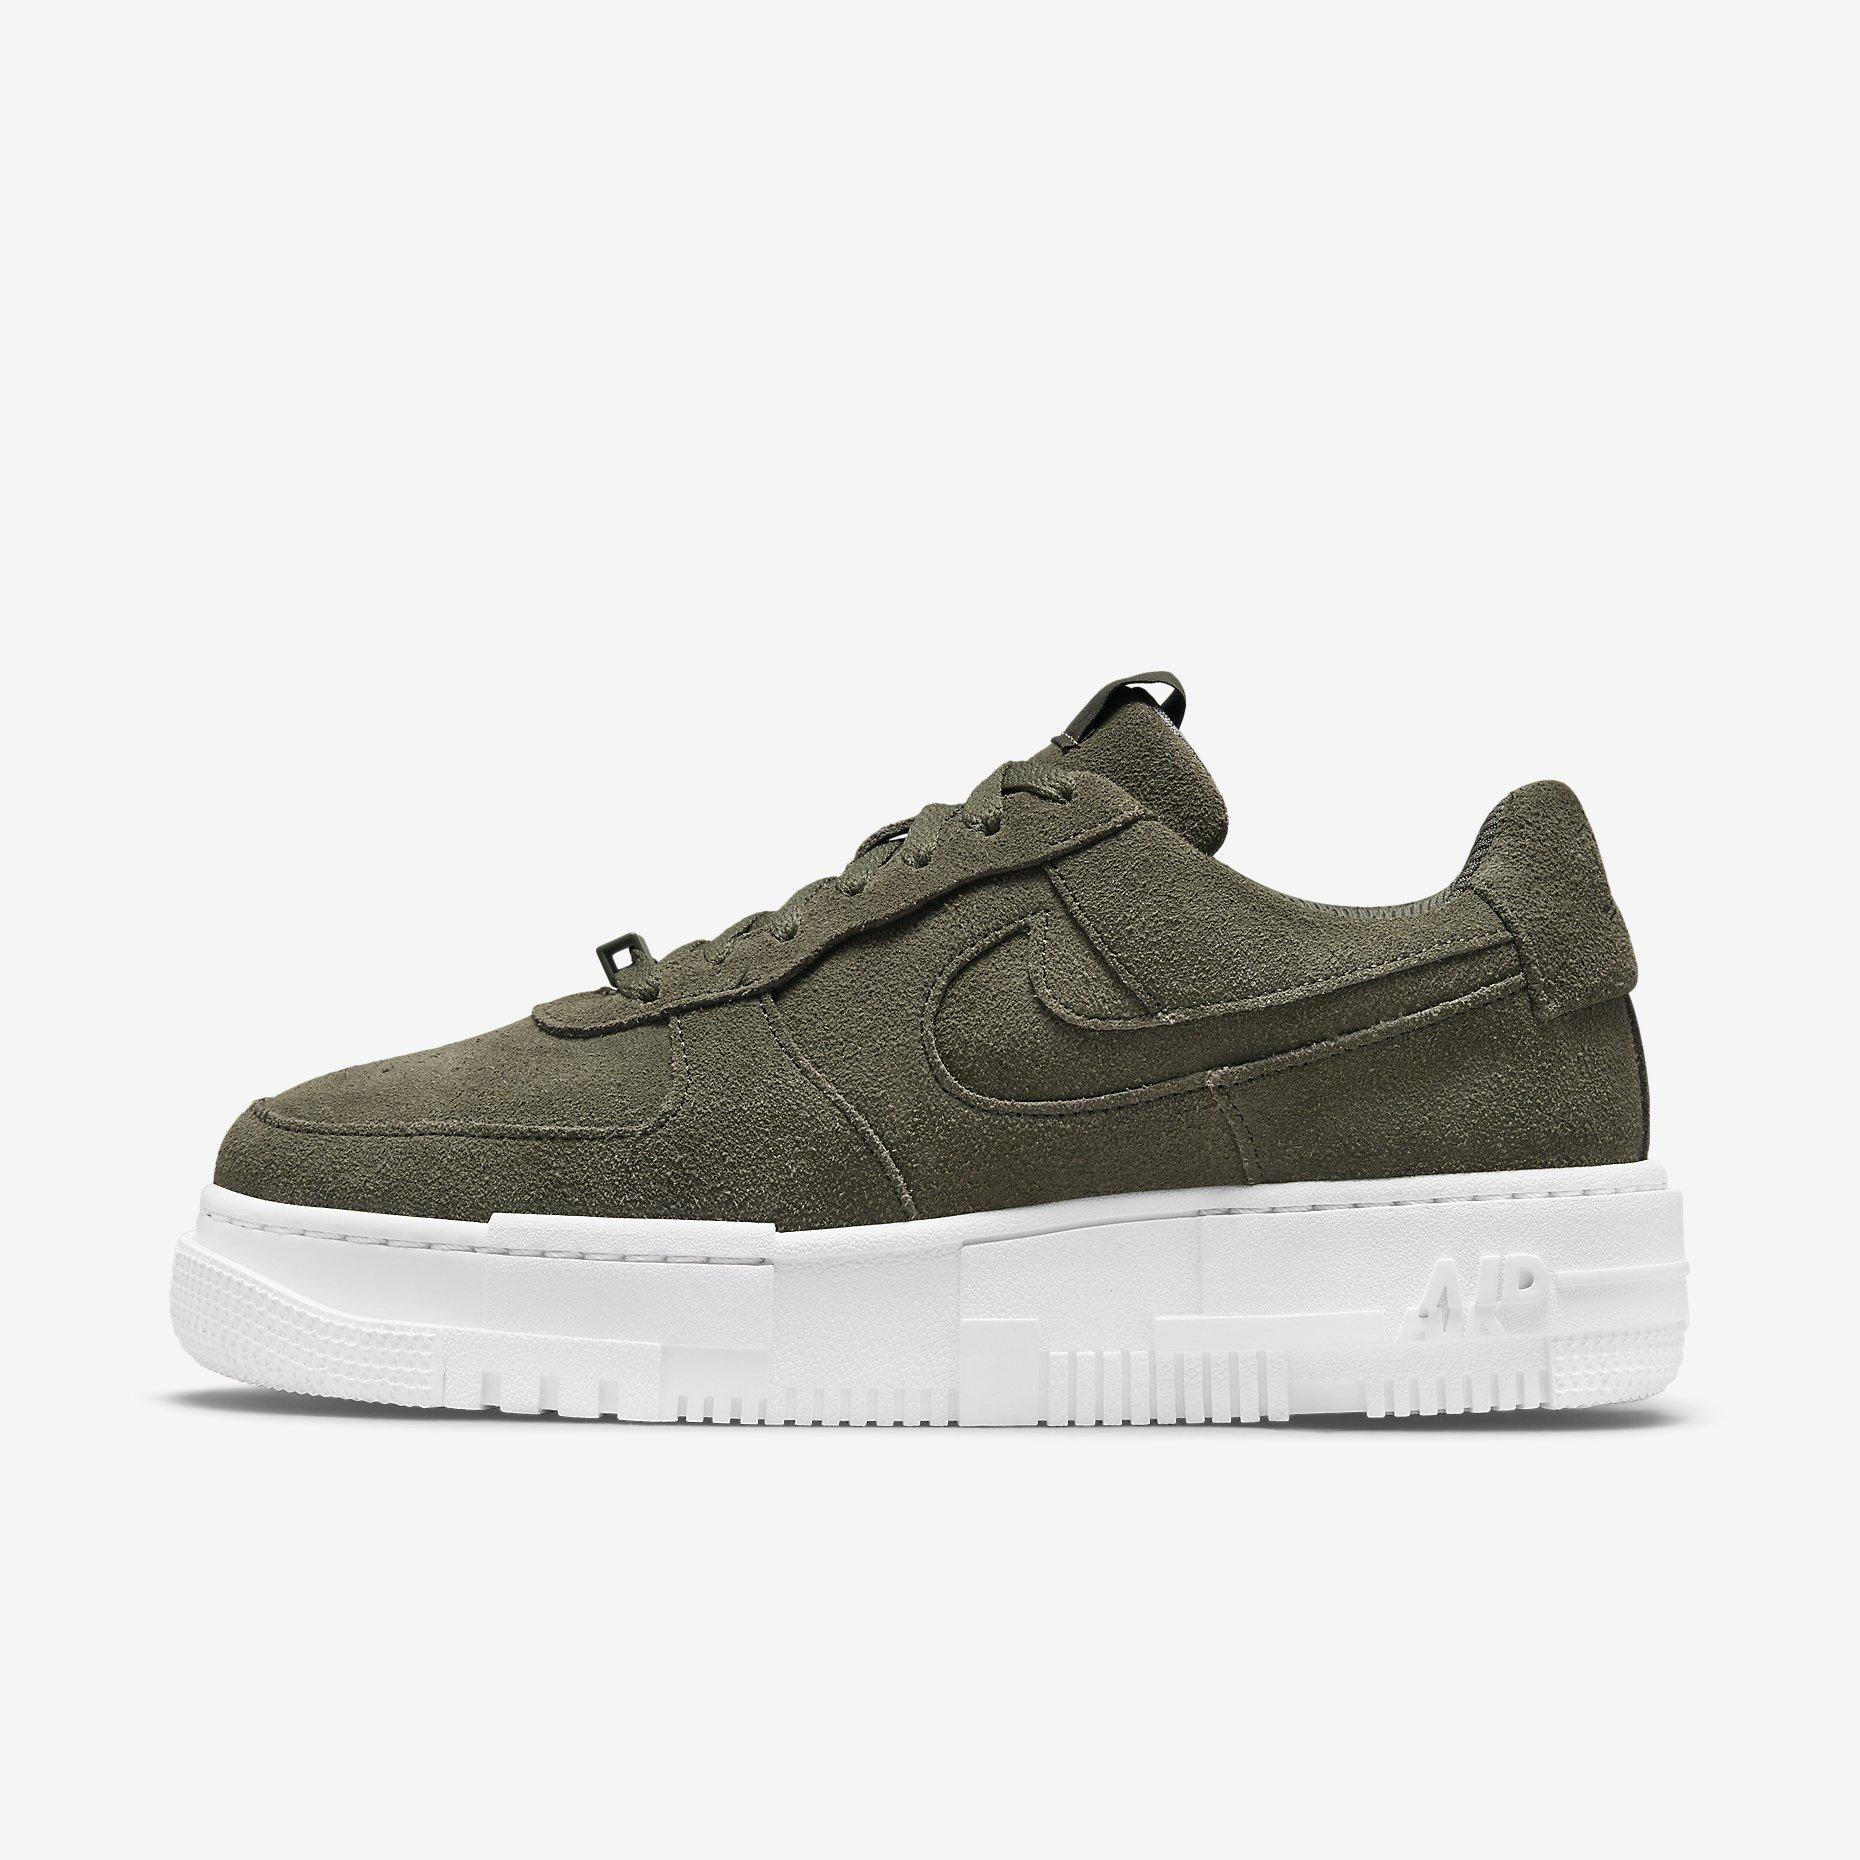 Women's Nike Air Force 1 Pixel 'Amethyst Ash'